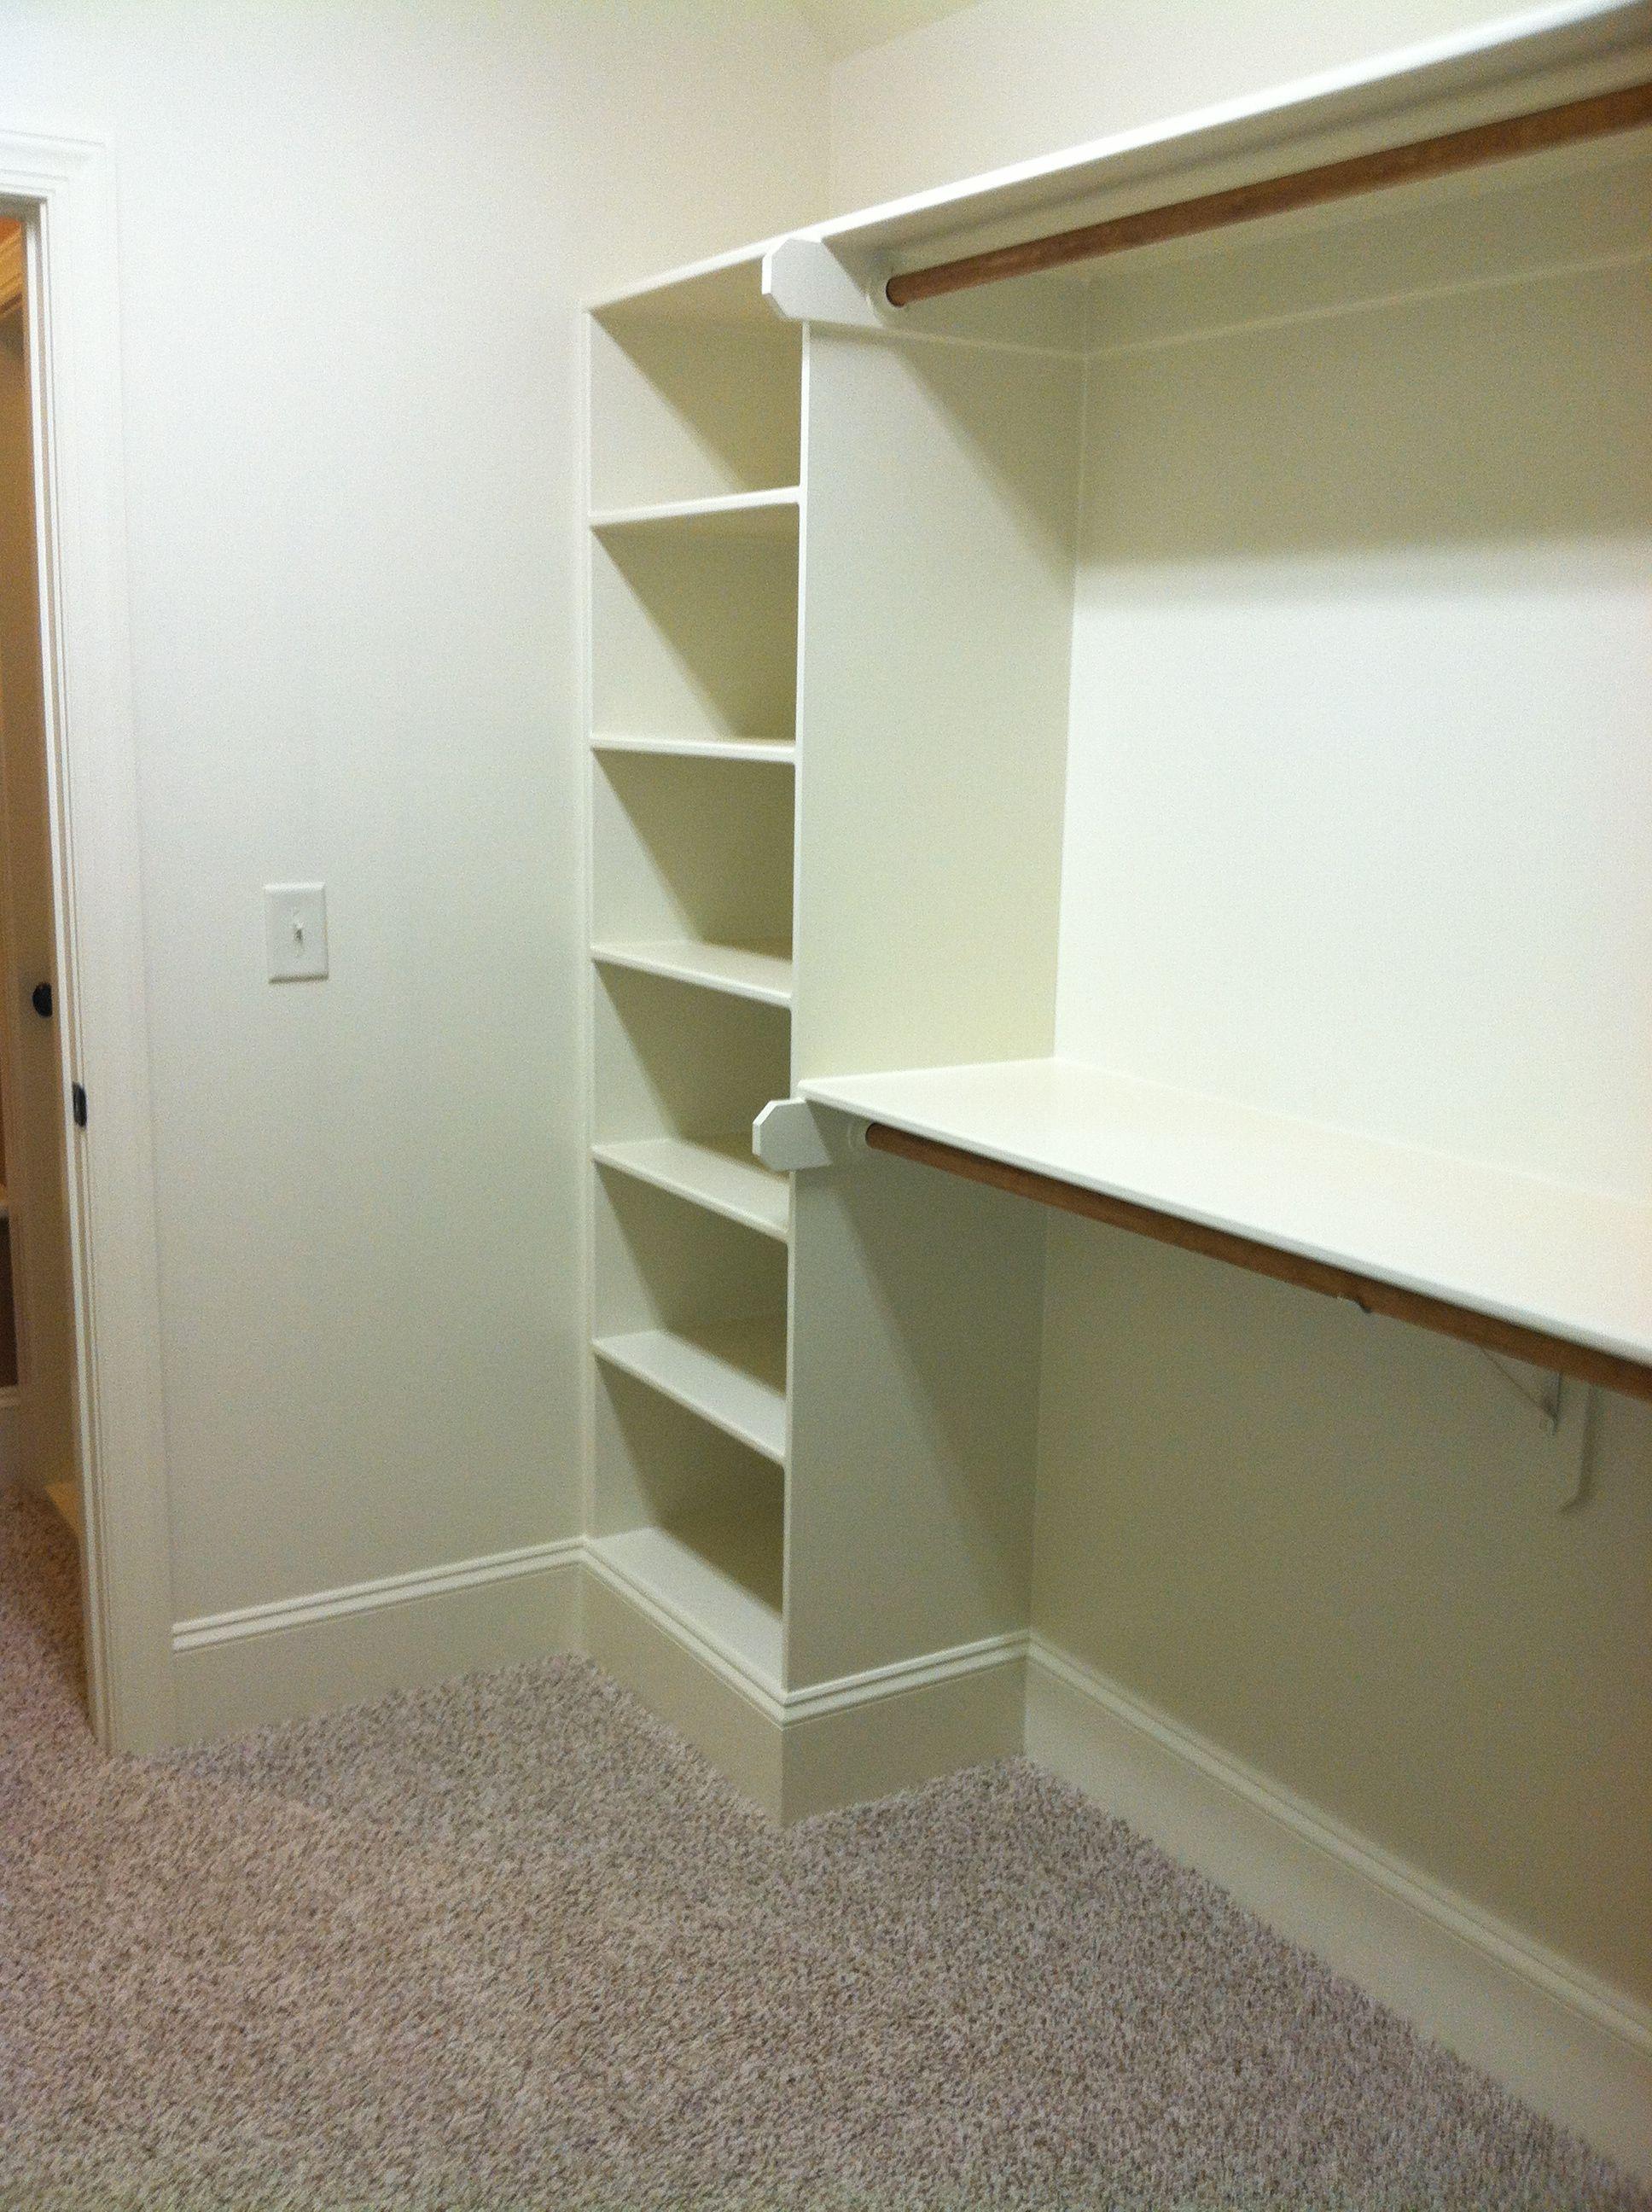 Loft bed organization ideas  nd Master closet nd Floor  Loft bed  Pinterest  Master closet